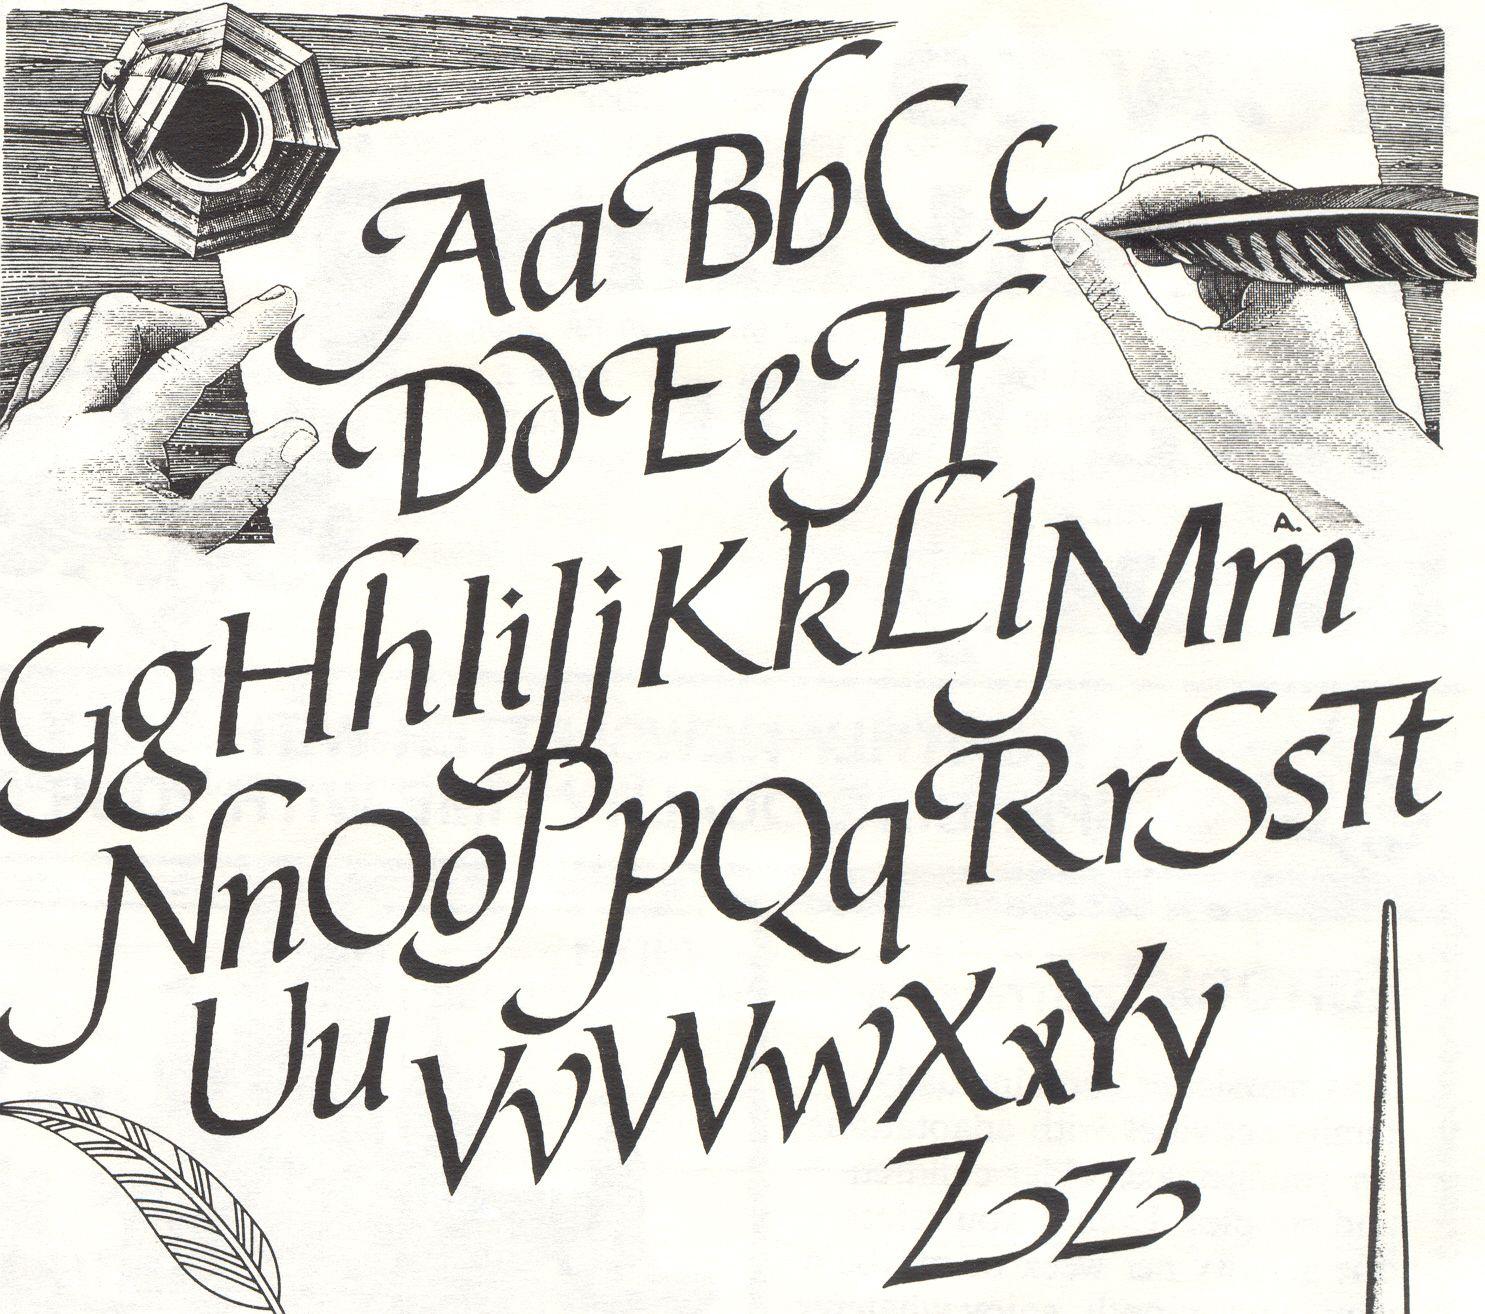 17 November Learn The Art Of Calligraphy